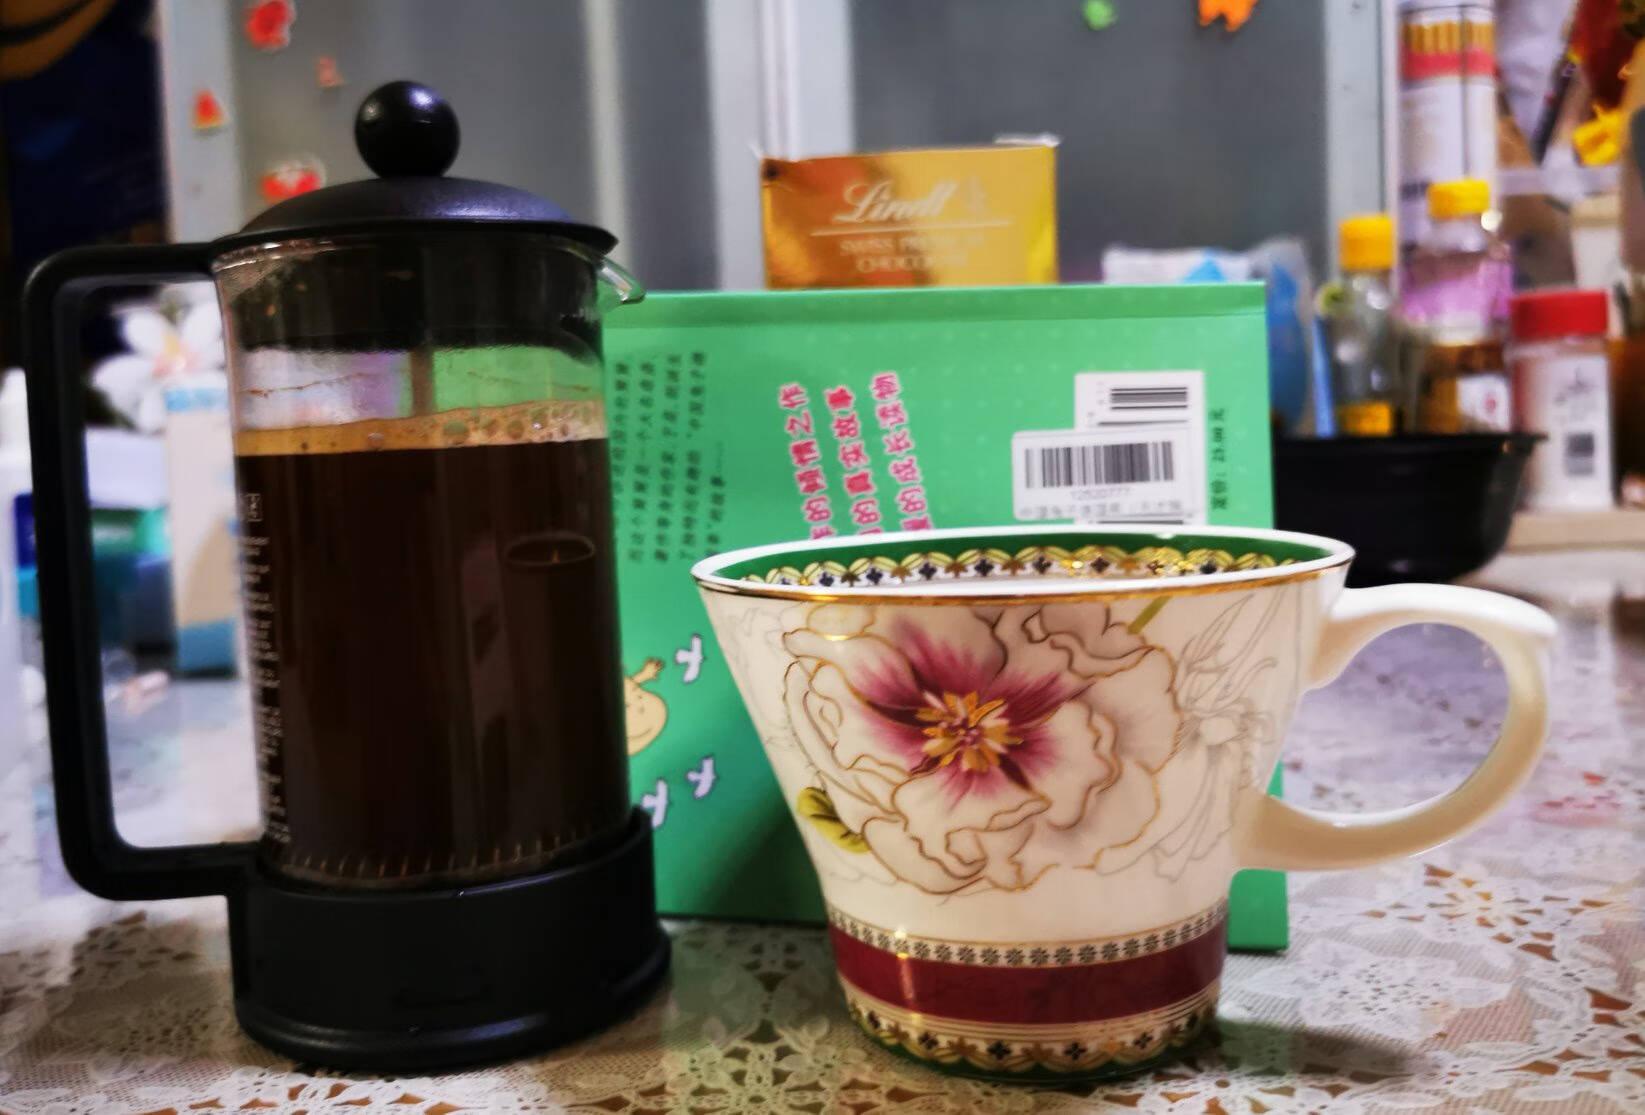 bodum波顿法压壶欧洲原装进口耐热玻璃咖啡壶咖啡杯过滤茶杯滤压小型多功能茶壶350ml黑色10948-01